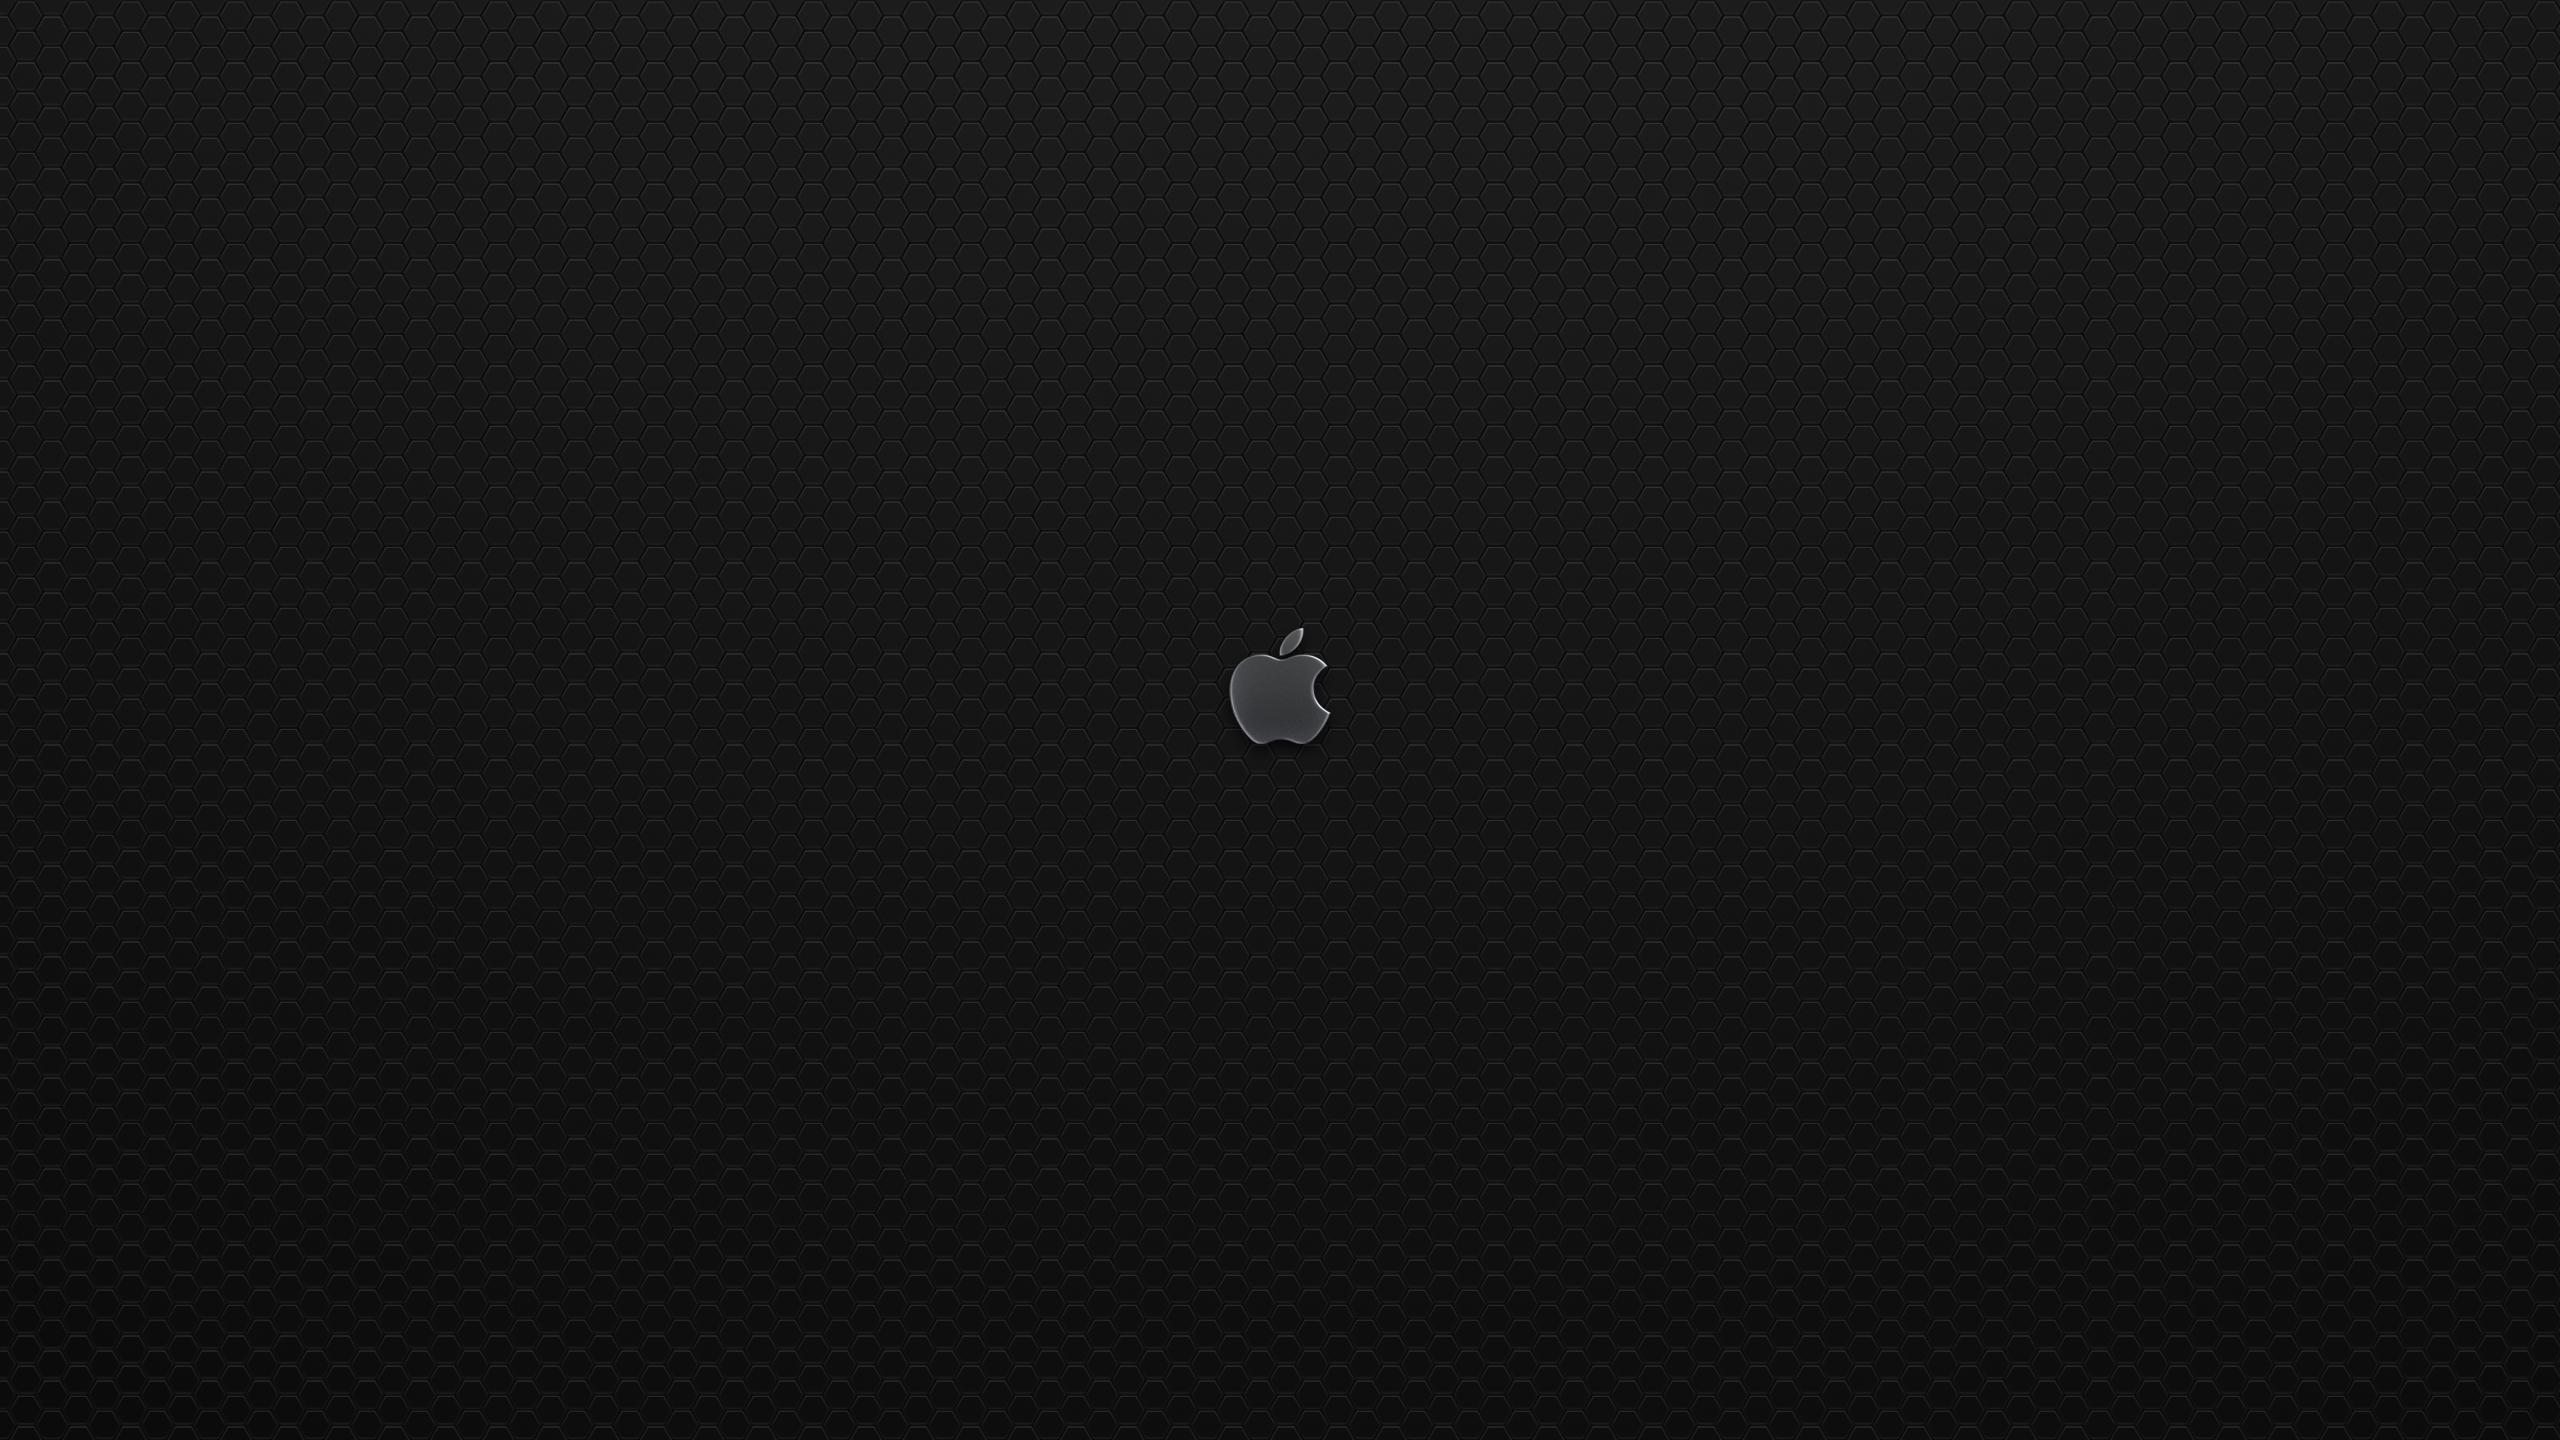 Apple Hex by monkeymagico